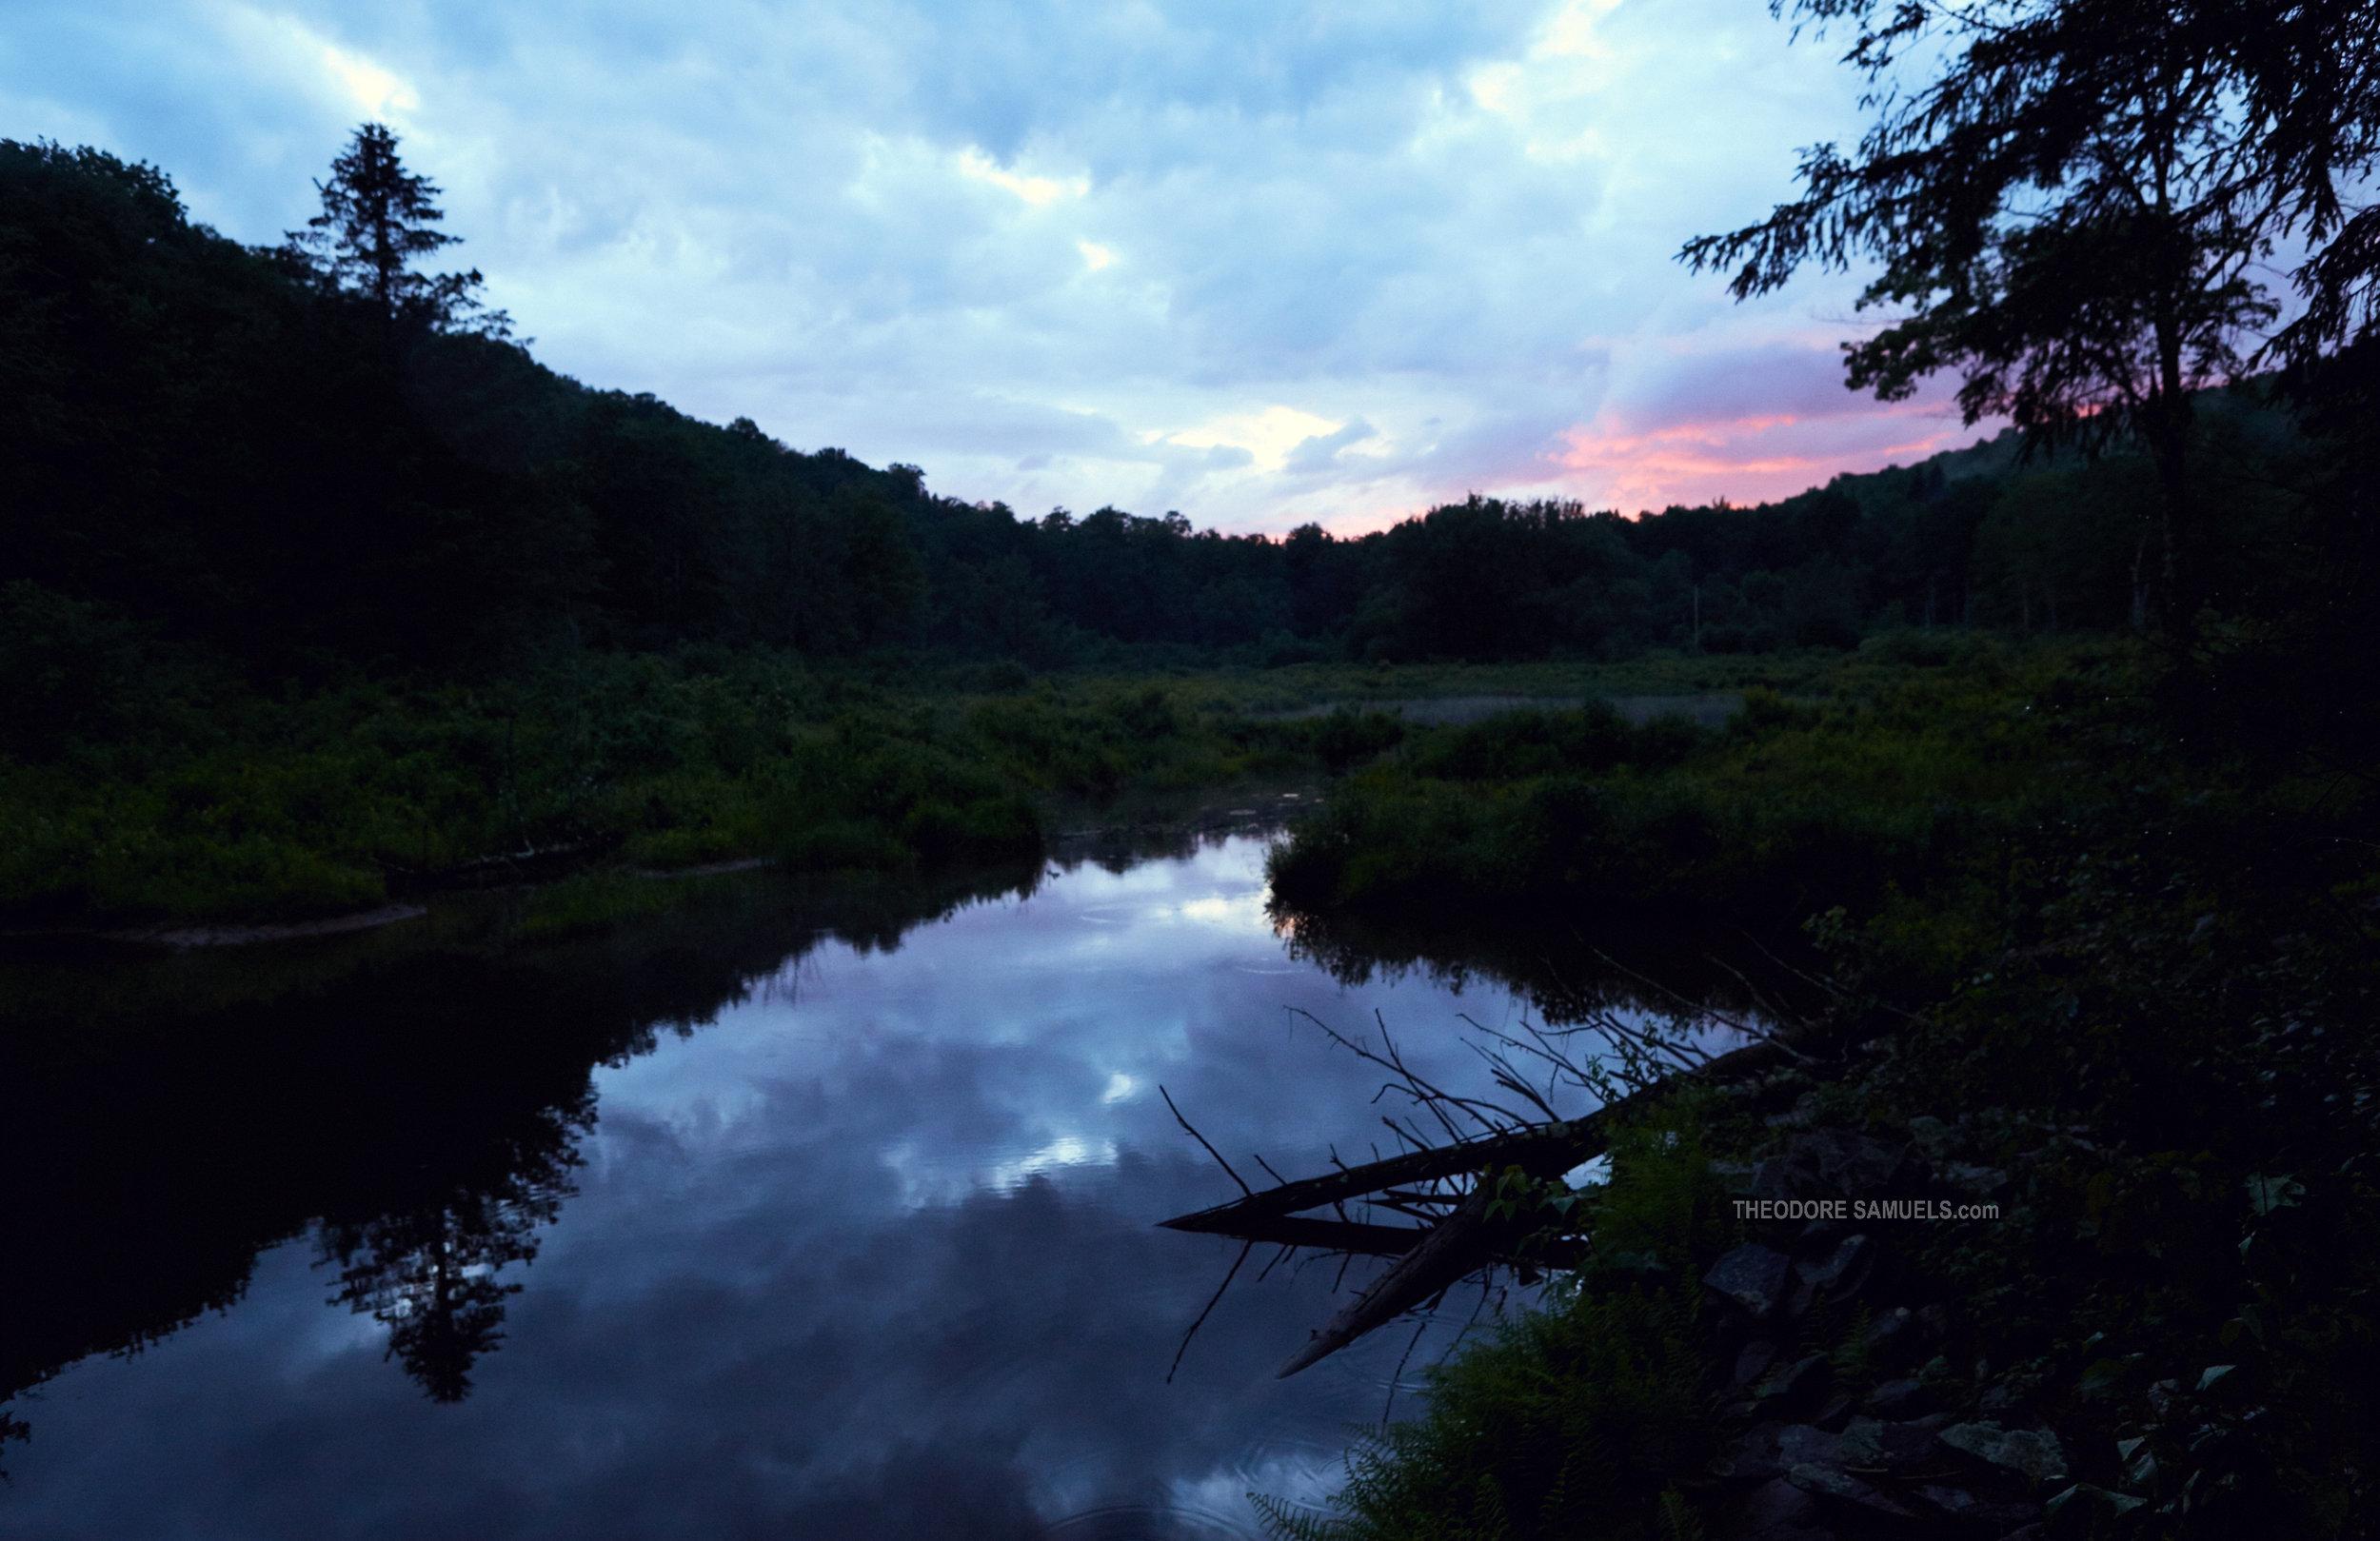 170625_Mastermind Camping_287.jpg